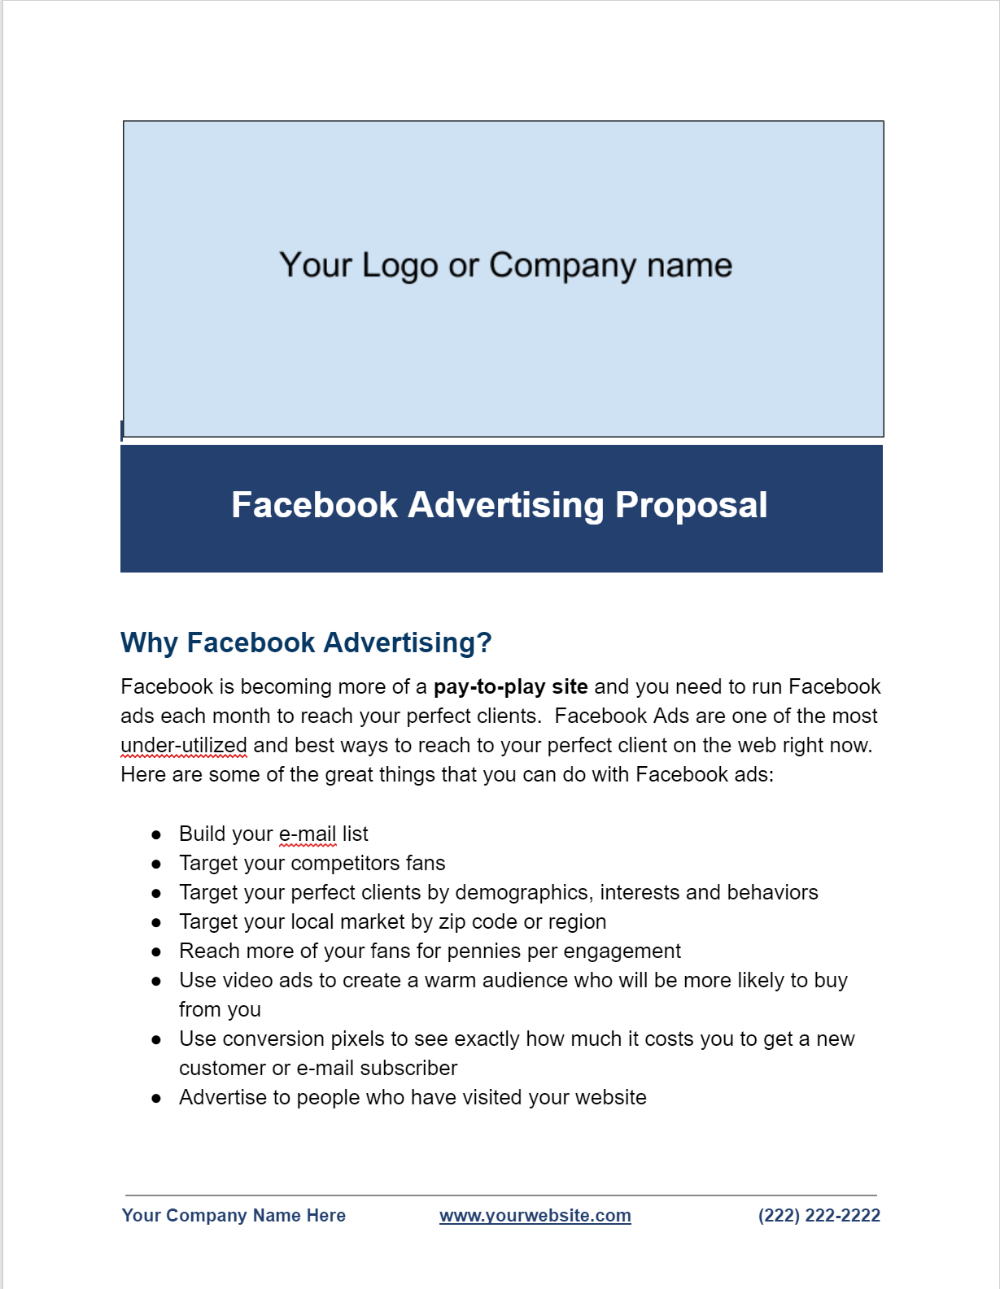 Facebook Ads Proposal Template Facebook Advertising Secrets Inside Advertising Proposal Template 10 Prof Proposal Templates Facebook Advertising Facebook Ad